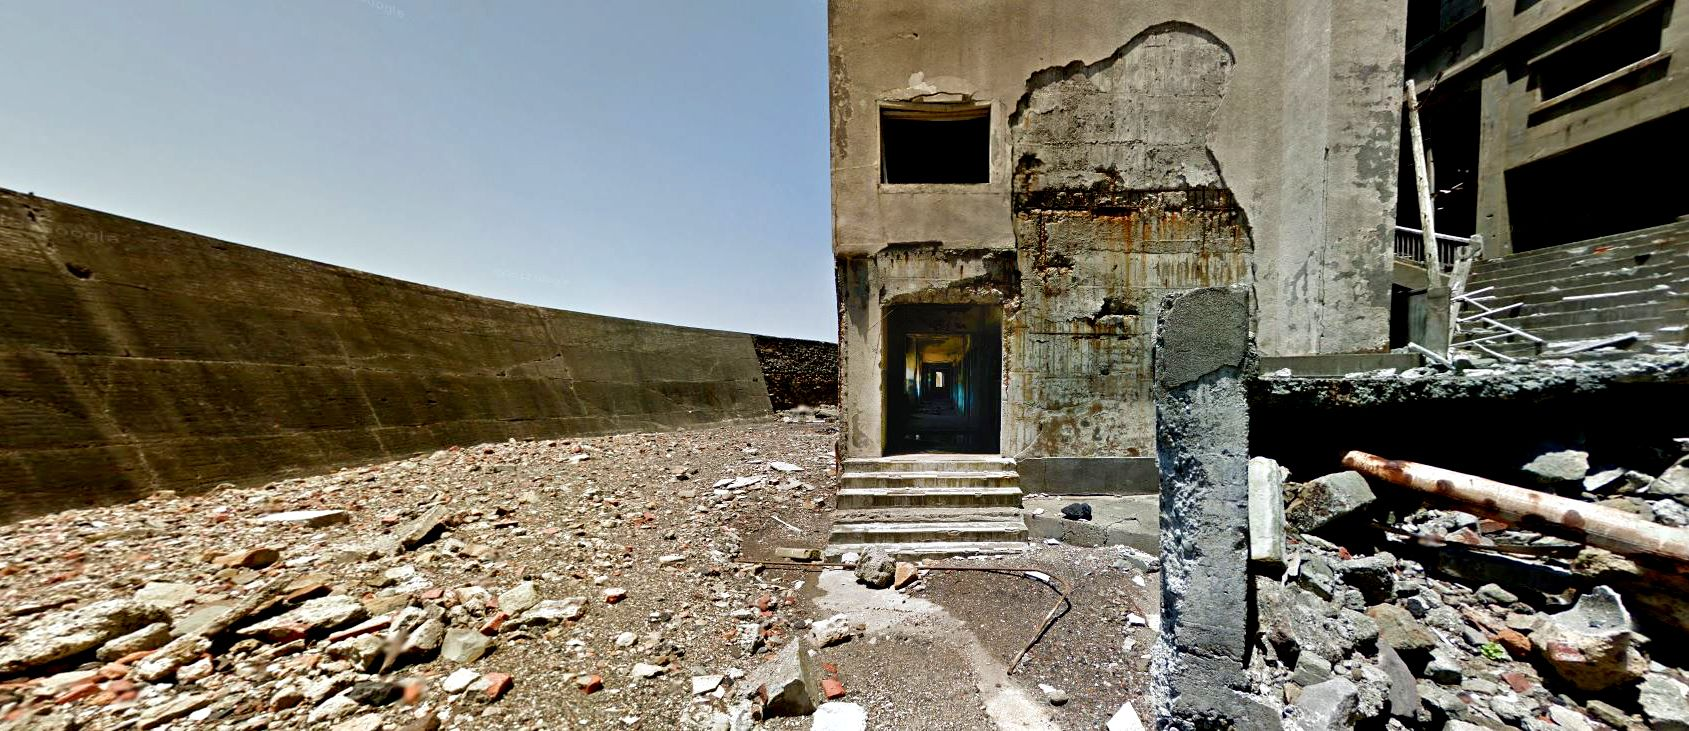 Google maps (Streetview) - Hasina